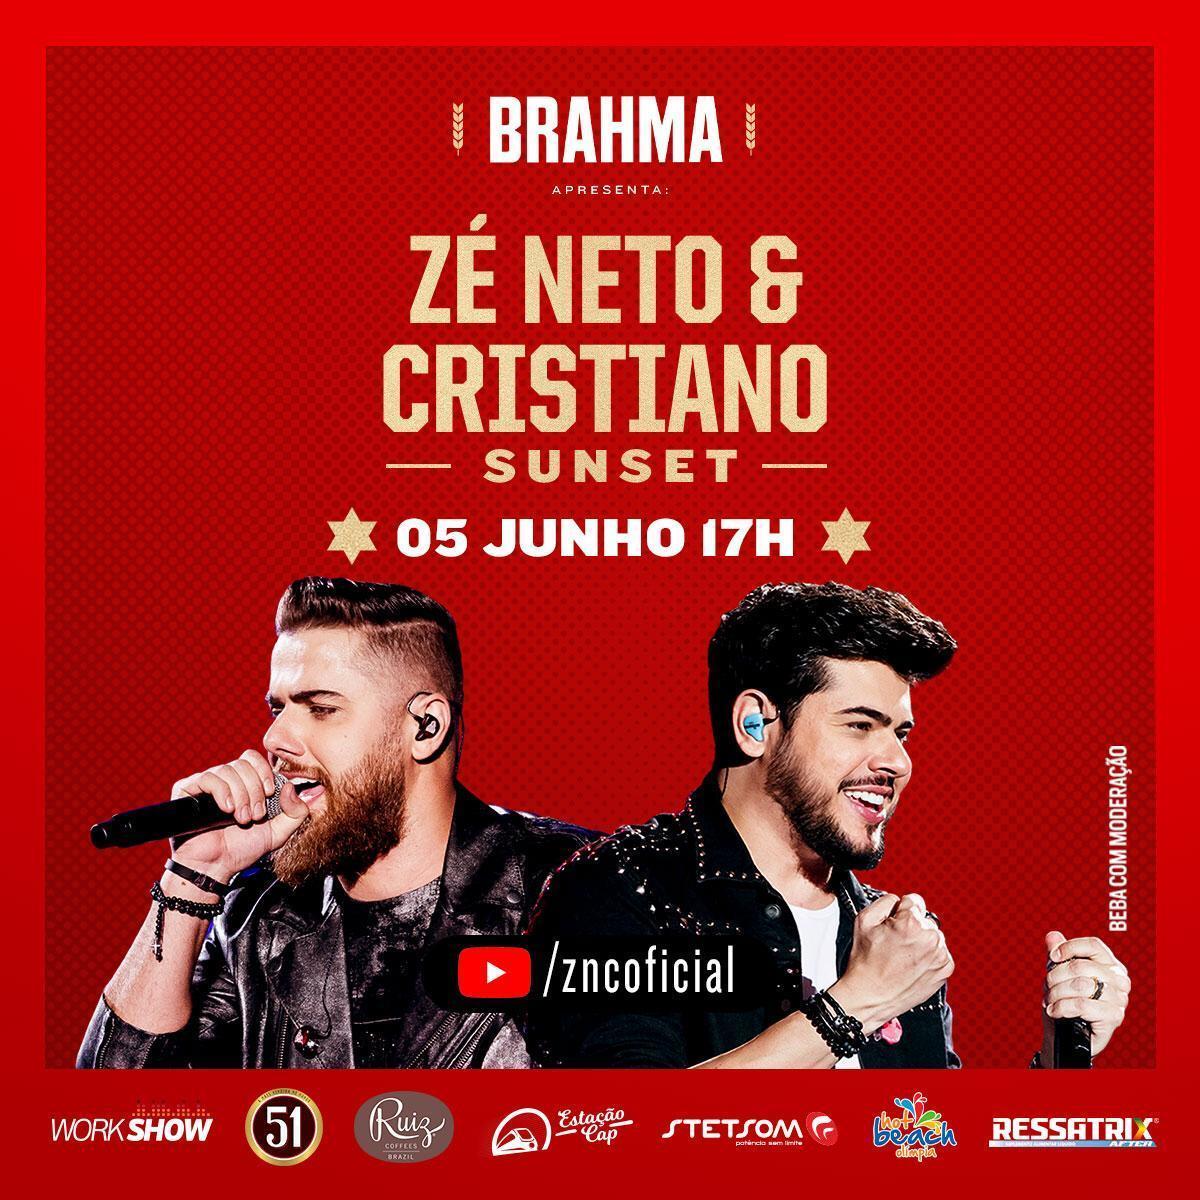 Zé Neto & Cristiano apresentam show virtual neste sábado (05) 18